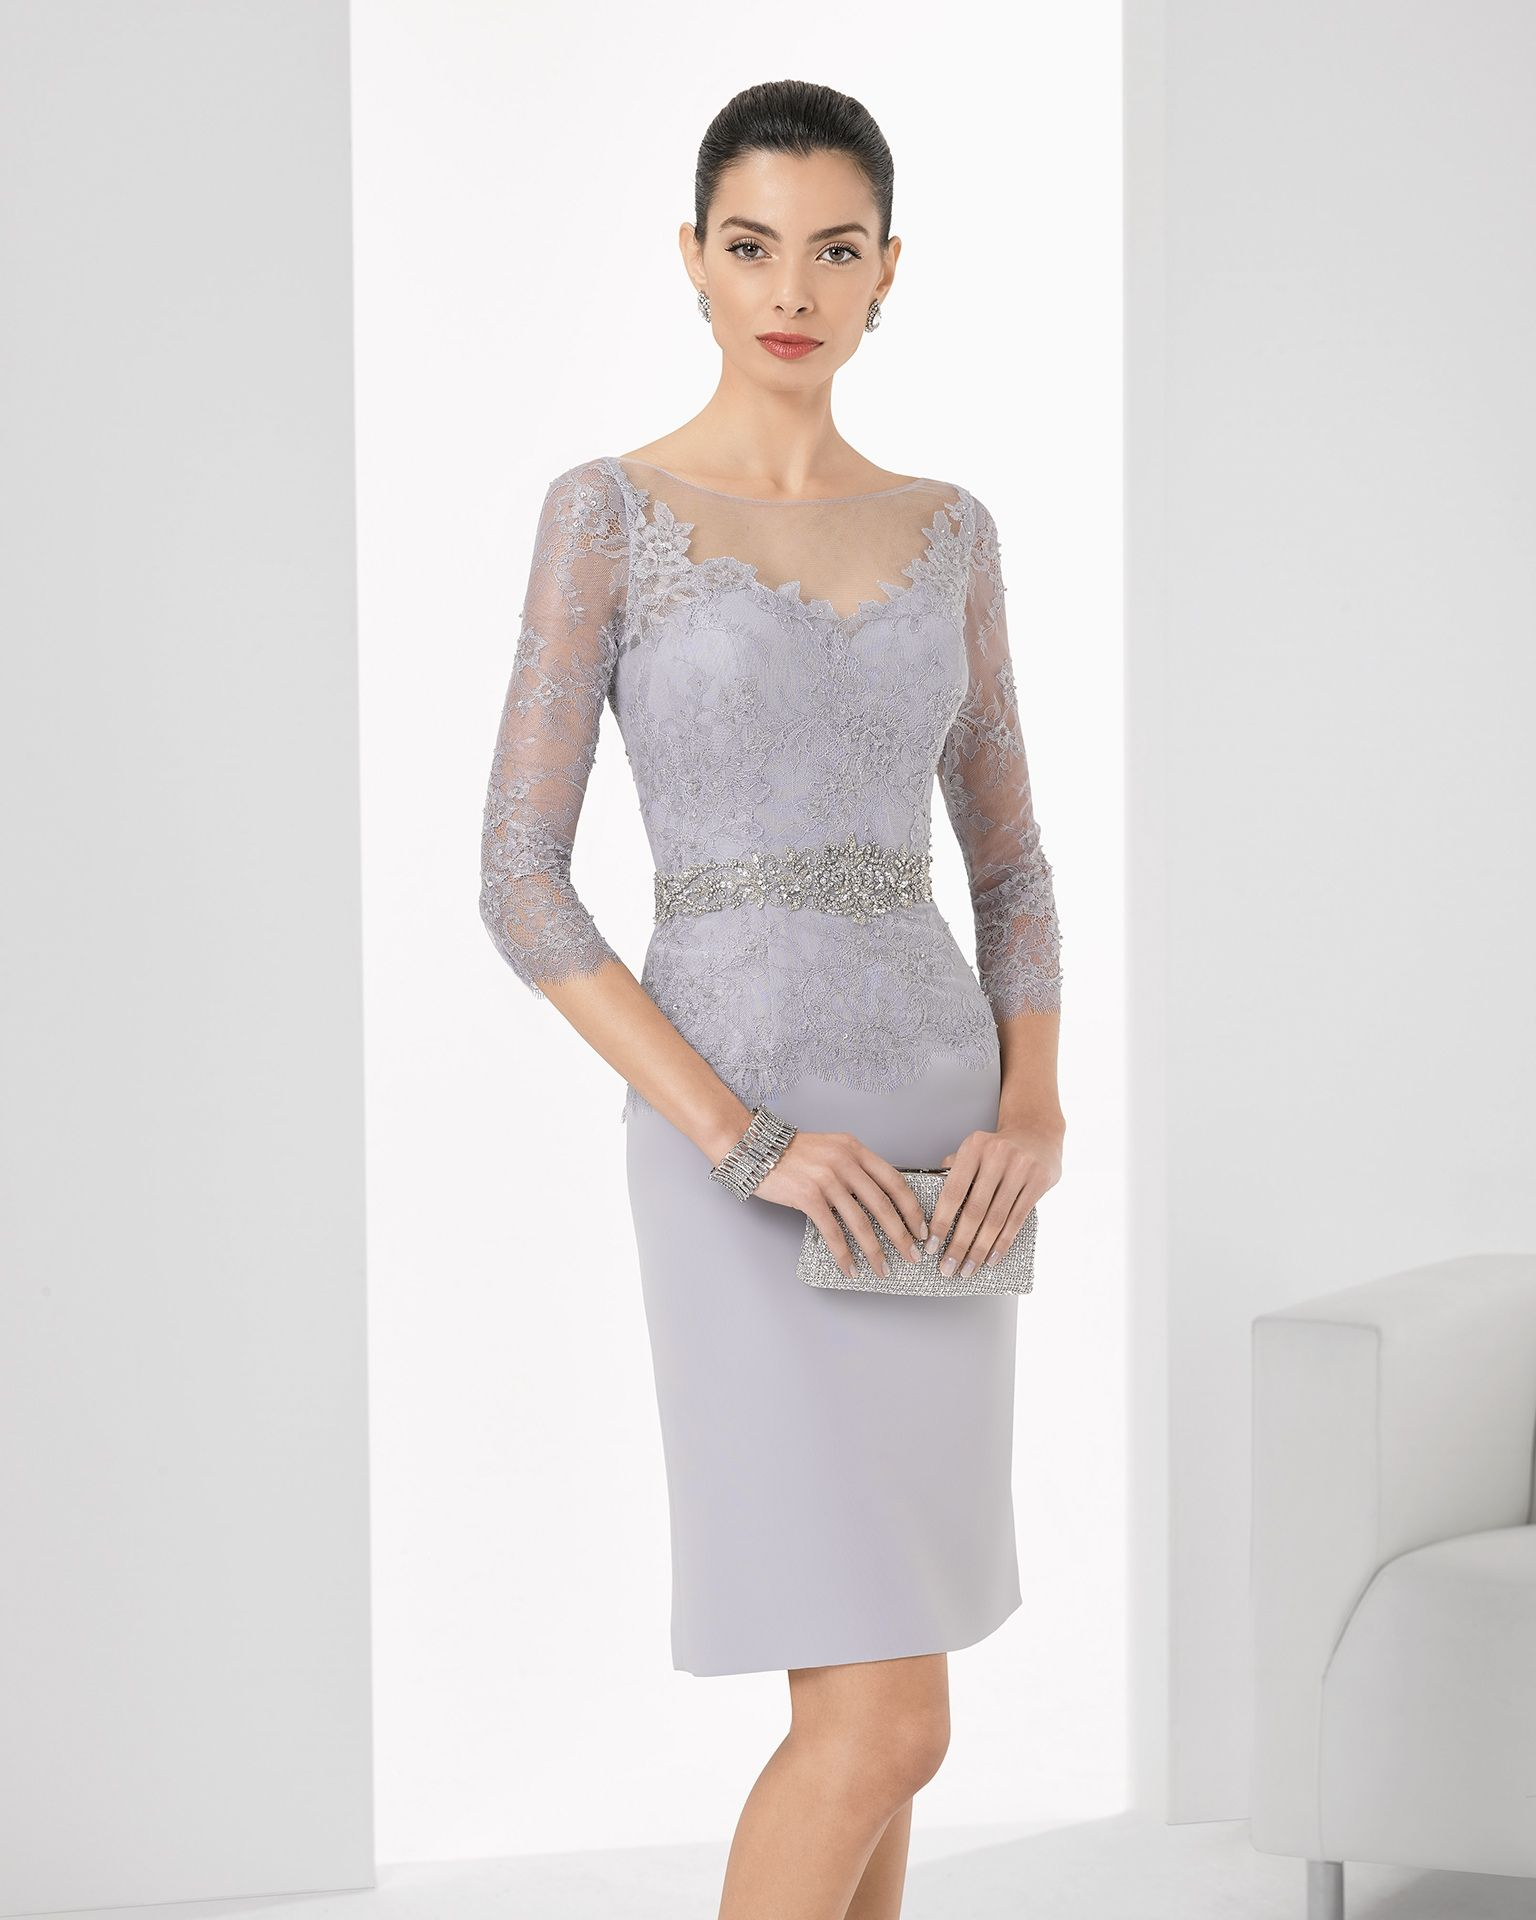 79a41f09b8 2016 9T195 COCKTAIL ROSA CLARA (Vestido de Fiesta). Diseñador  Rosa Clará.